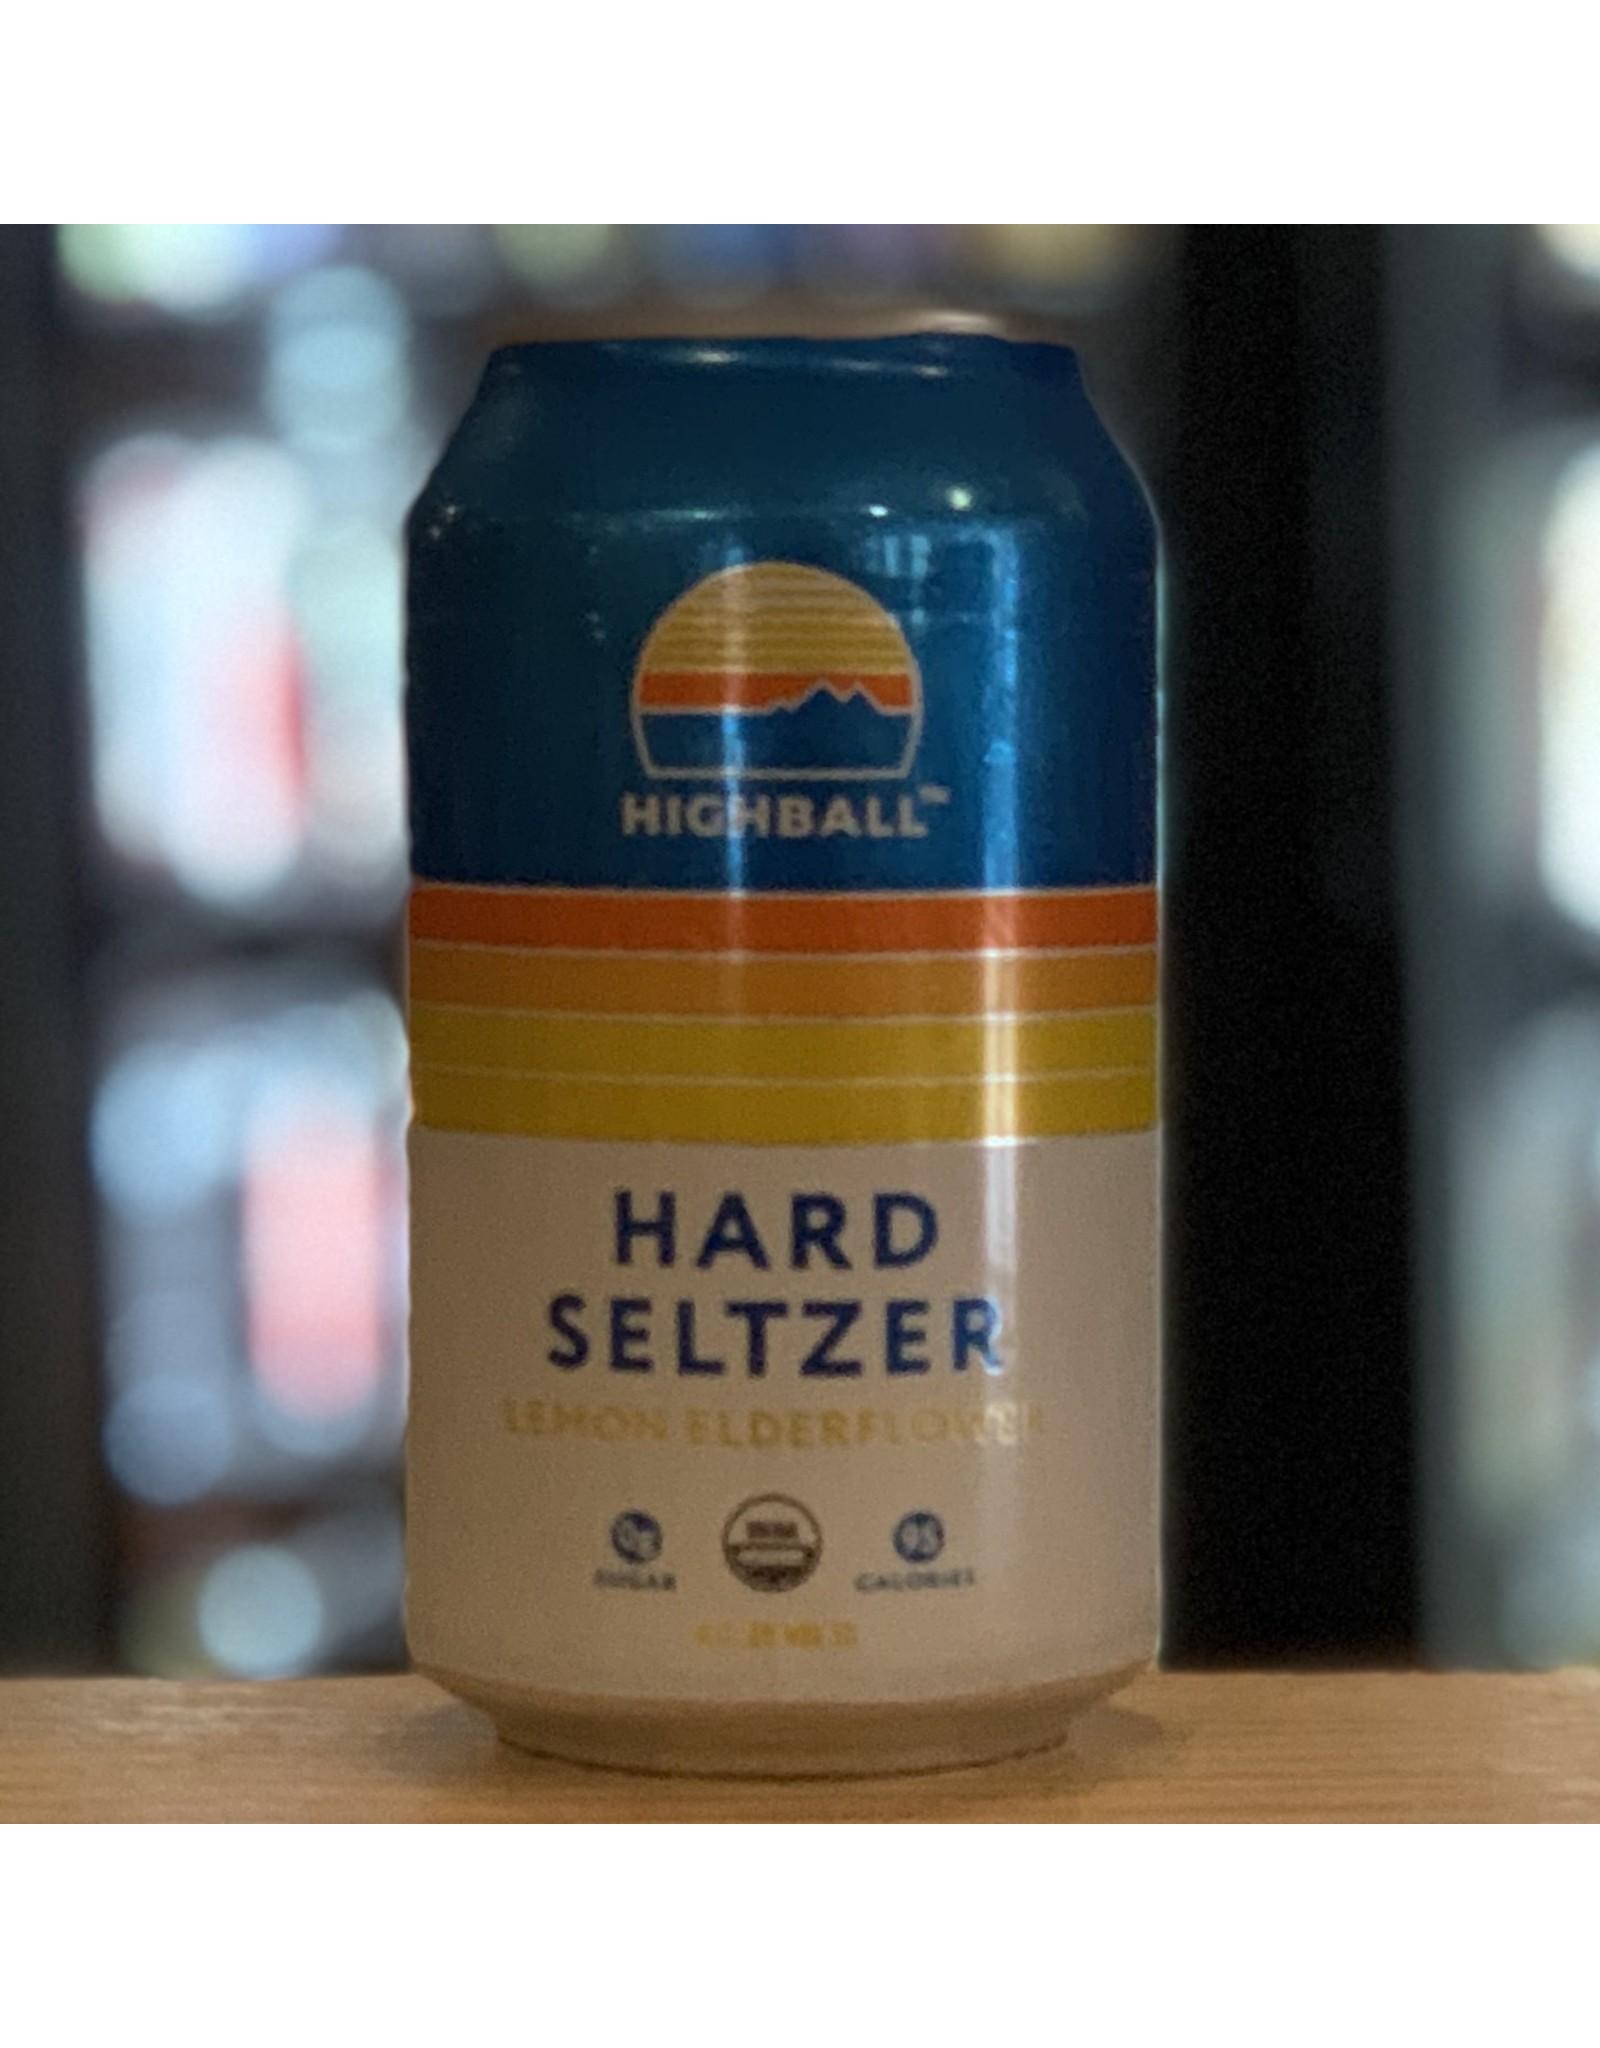 Hard Seltzer Peak Organic Brewing ''Highball'' Hard Seltzer w/Lemon and Elderberry - Portland, ME